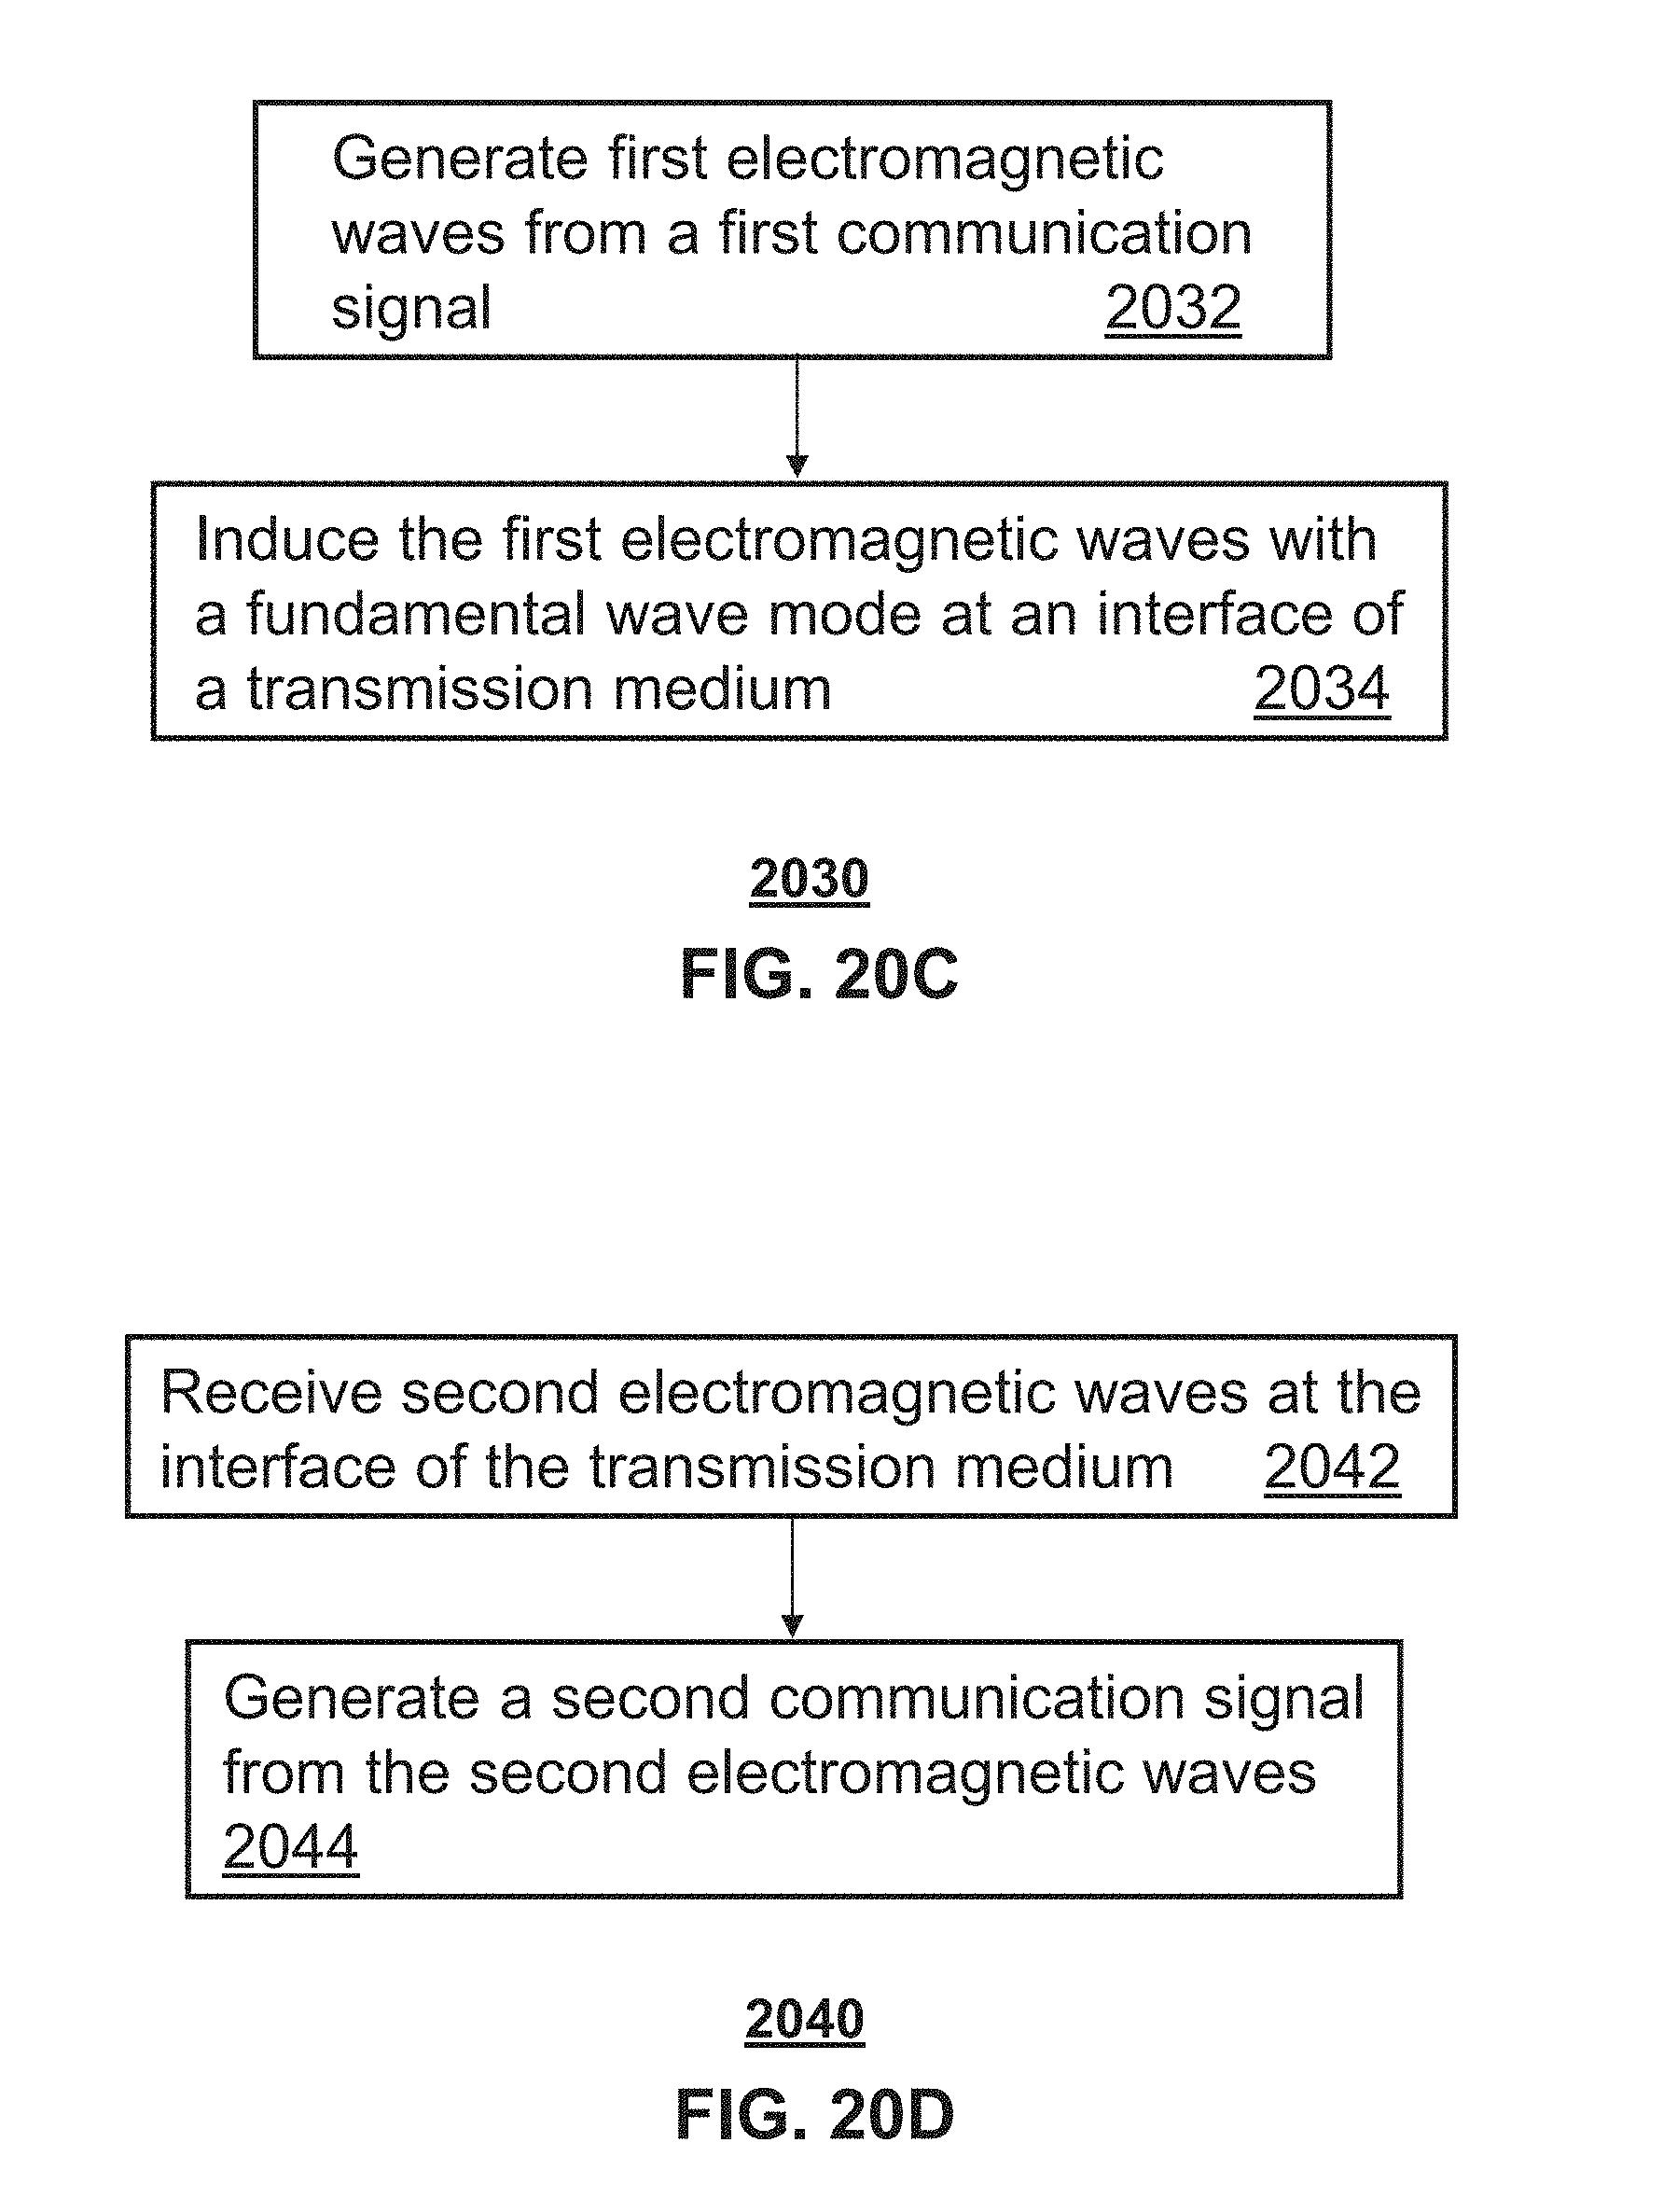 Patent US 9,793,951 B2